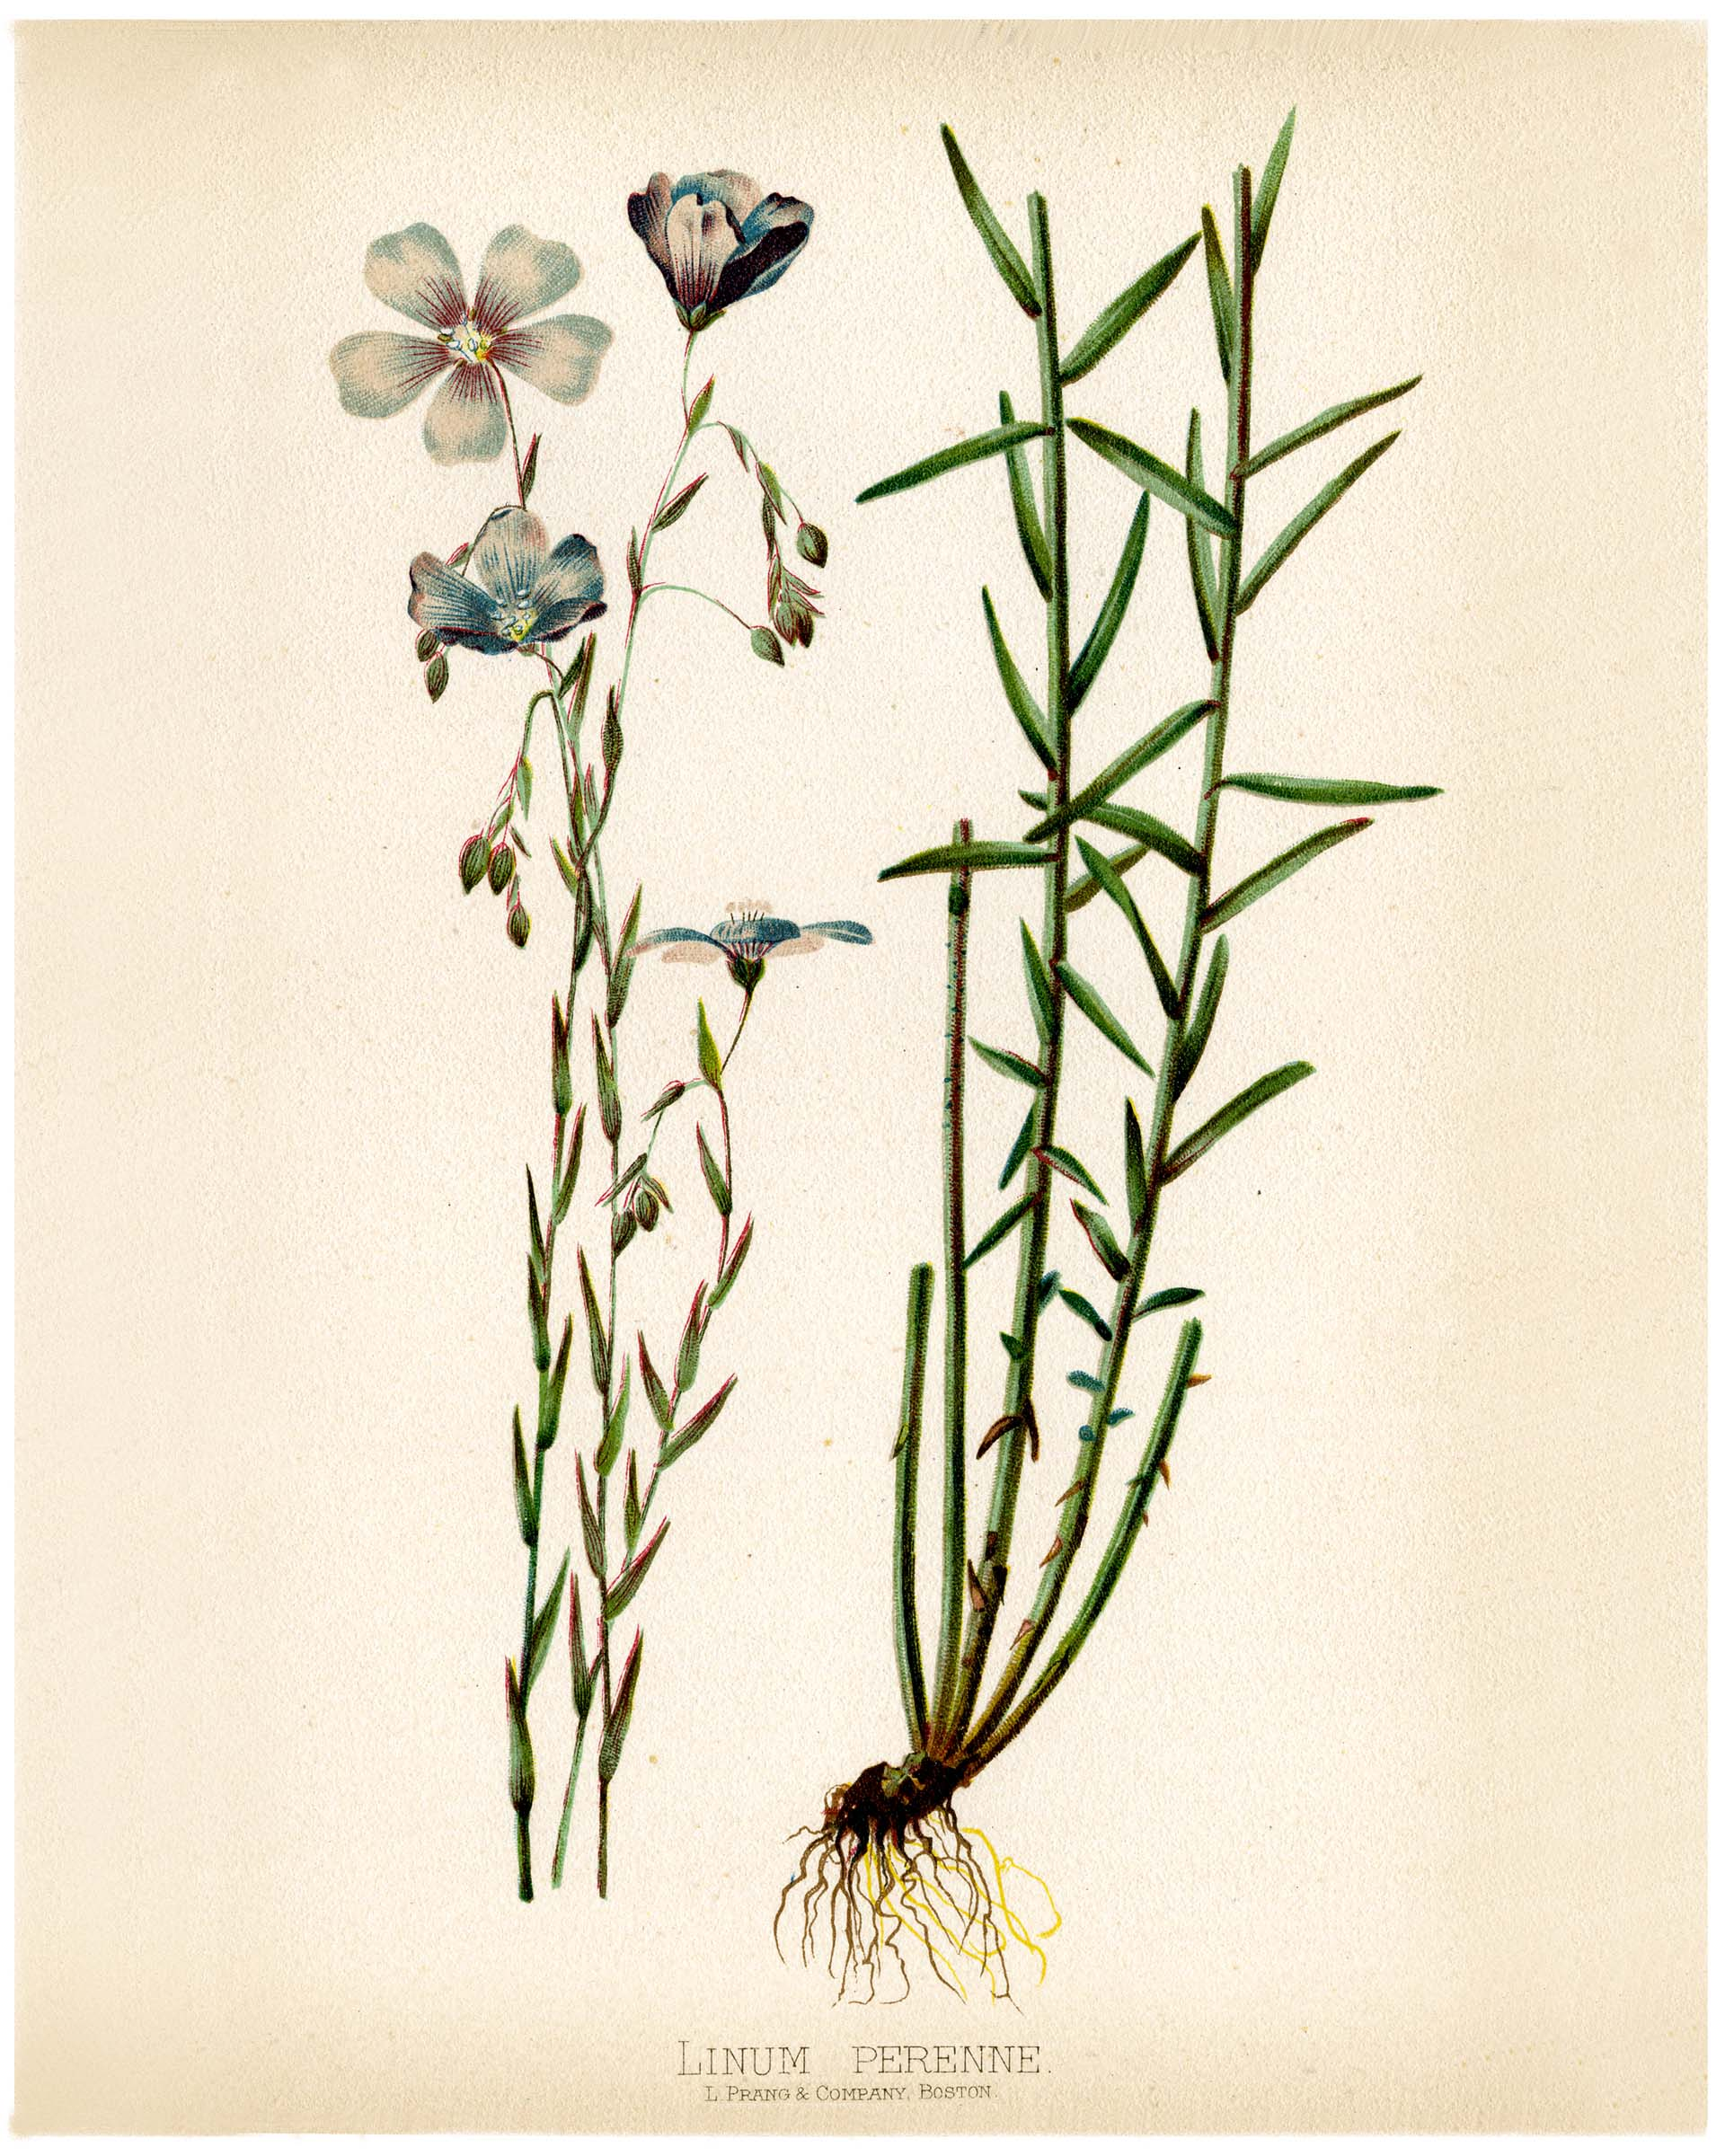 Linium perenne (blue flax, lint) by Alois Lunzer